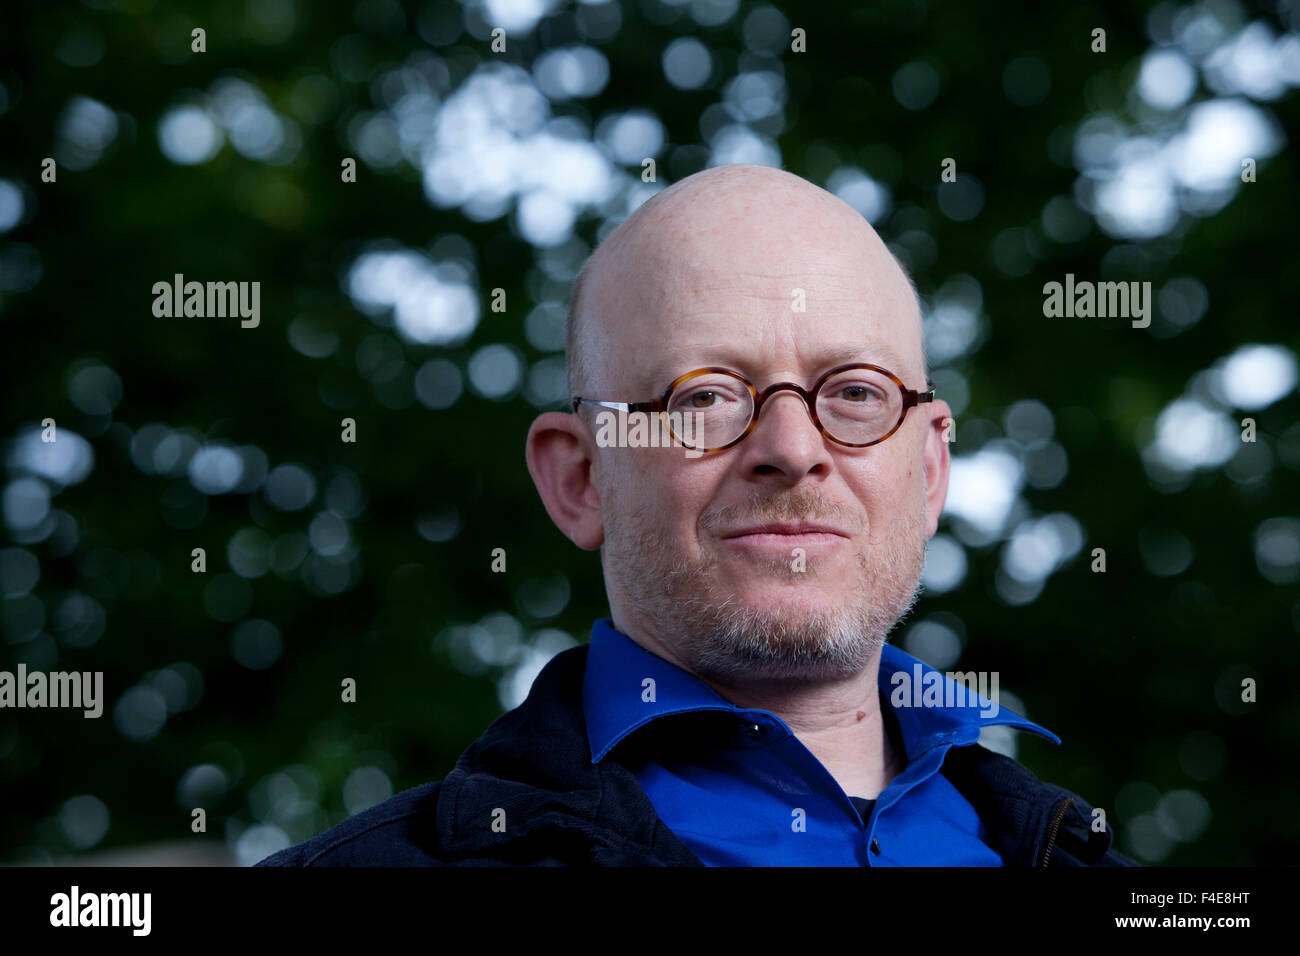 Timur Vermes, the German writer, at the Edinburgh International Book Festival 2015. Edinburgh, Scotland. 23rd August Stock Photo